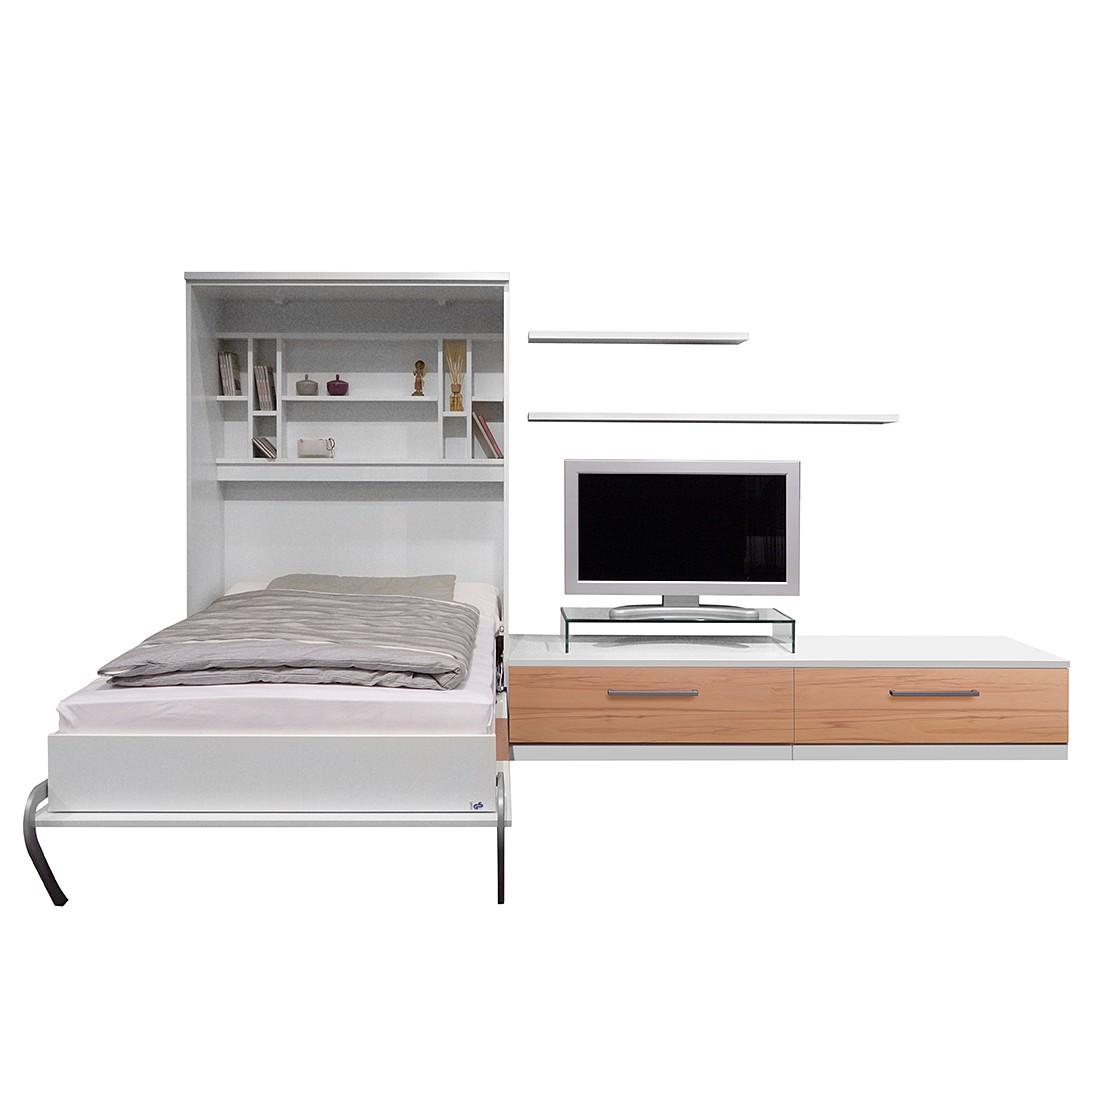 home24 Schrankbett-Kombination Majano | Schlafzimmer > Betten > Schrankbetten | Weiss | loftscape